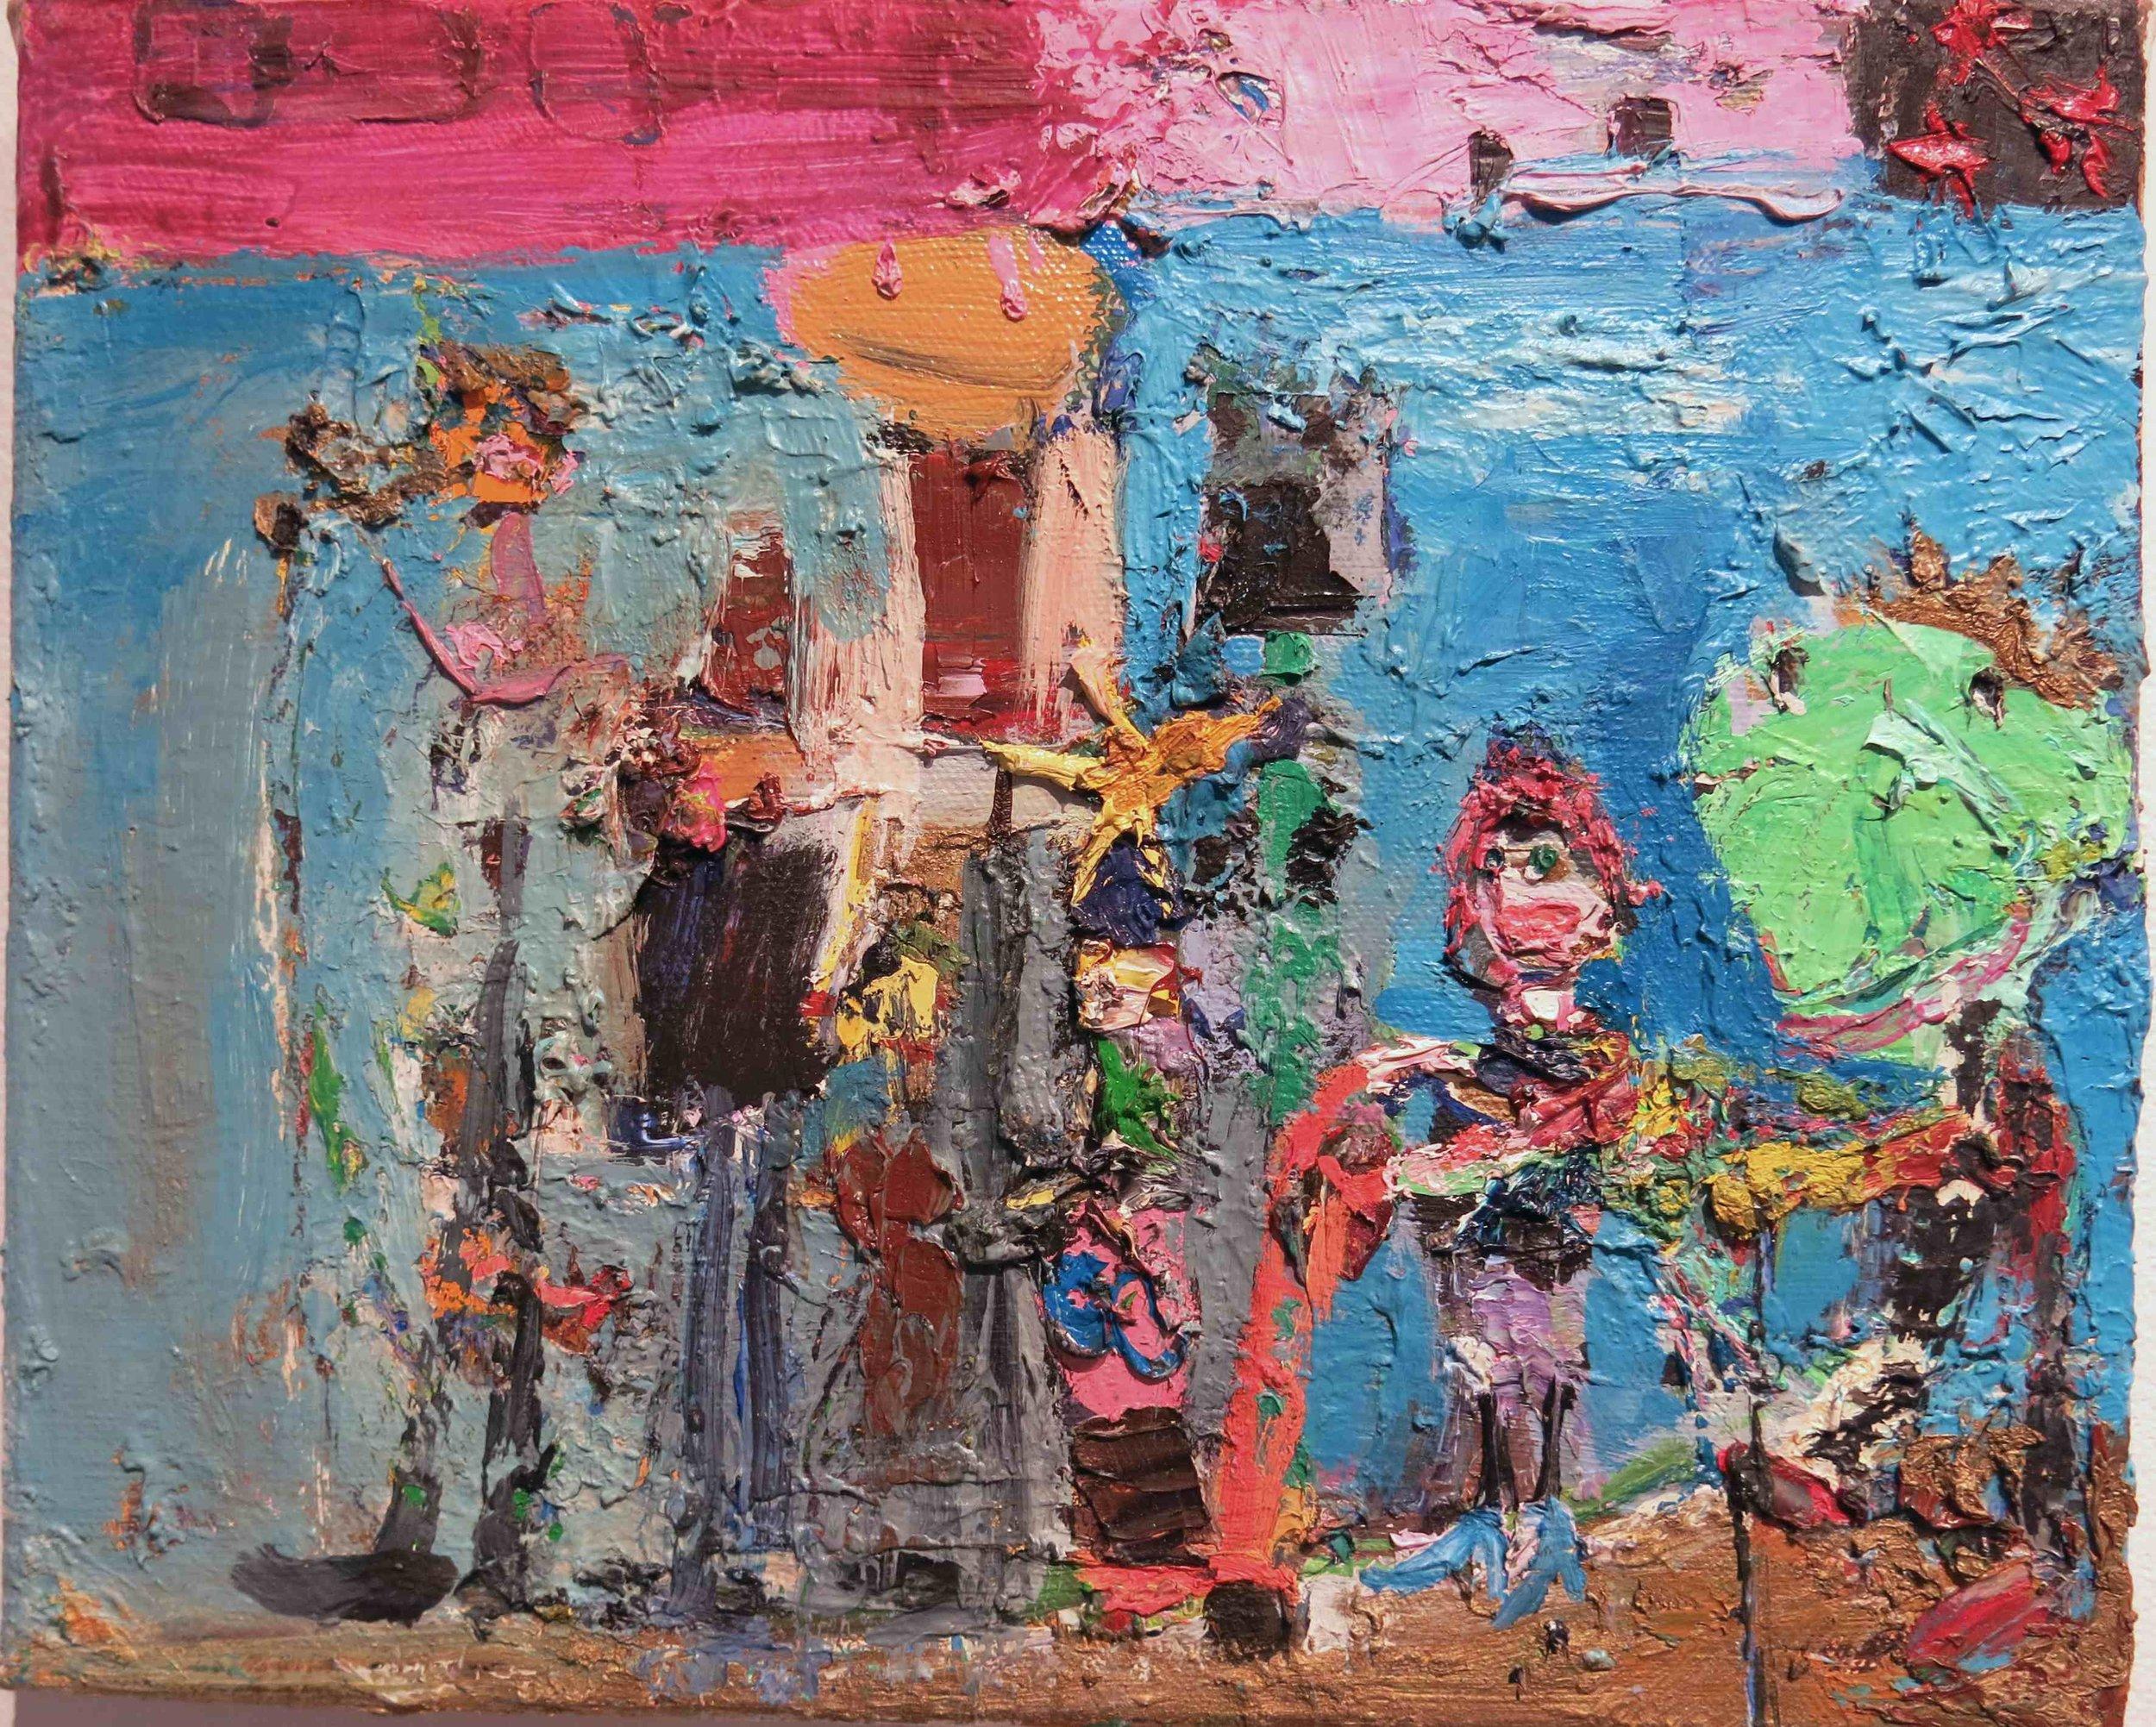 Matt Blackwell, Procession (study) , 2007, Oil on canvas, 9h x 11w in.